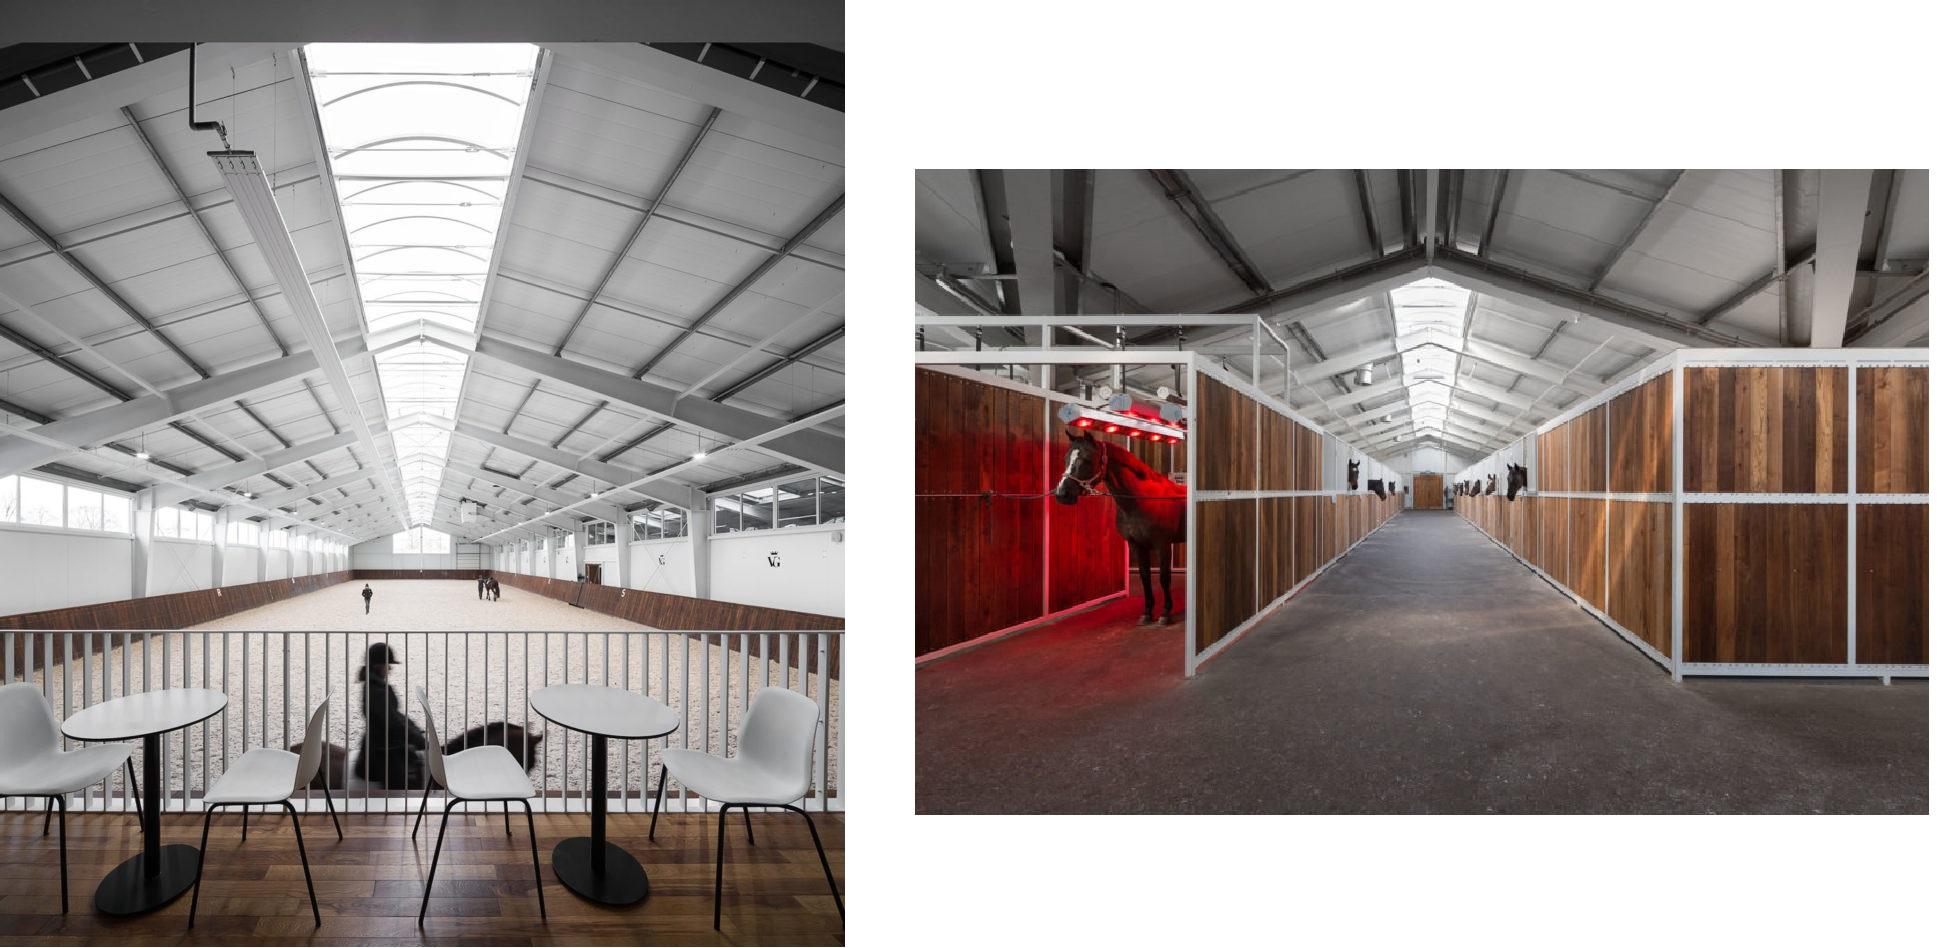 Конно-спортивный клуб, VG Horse Club, коллаж LIGA.net, фото: Drozdov & Partners